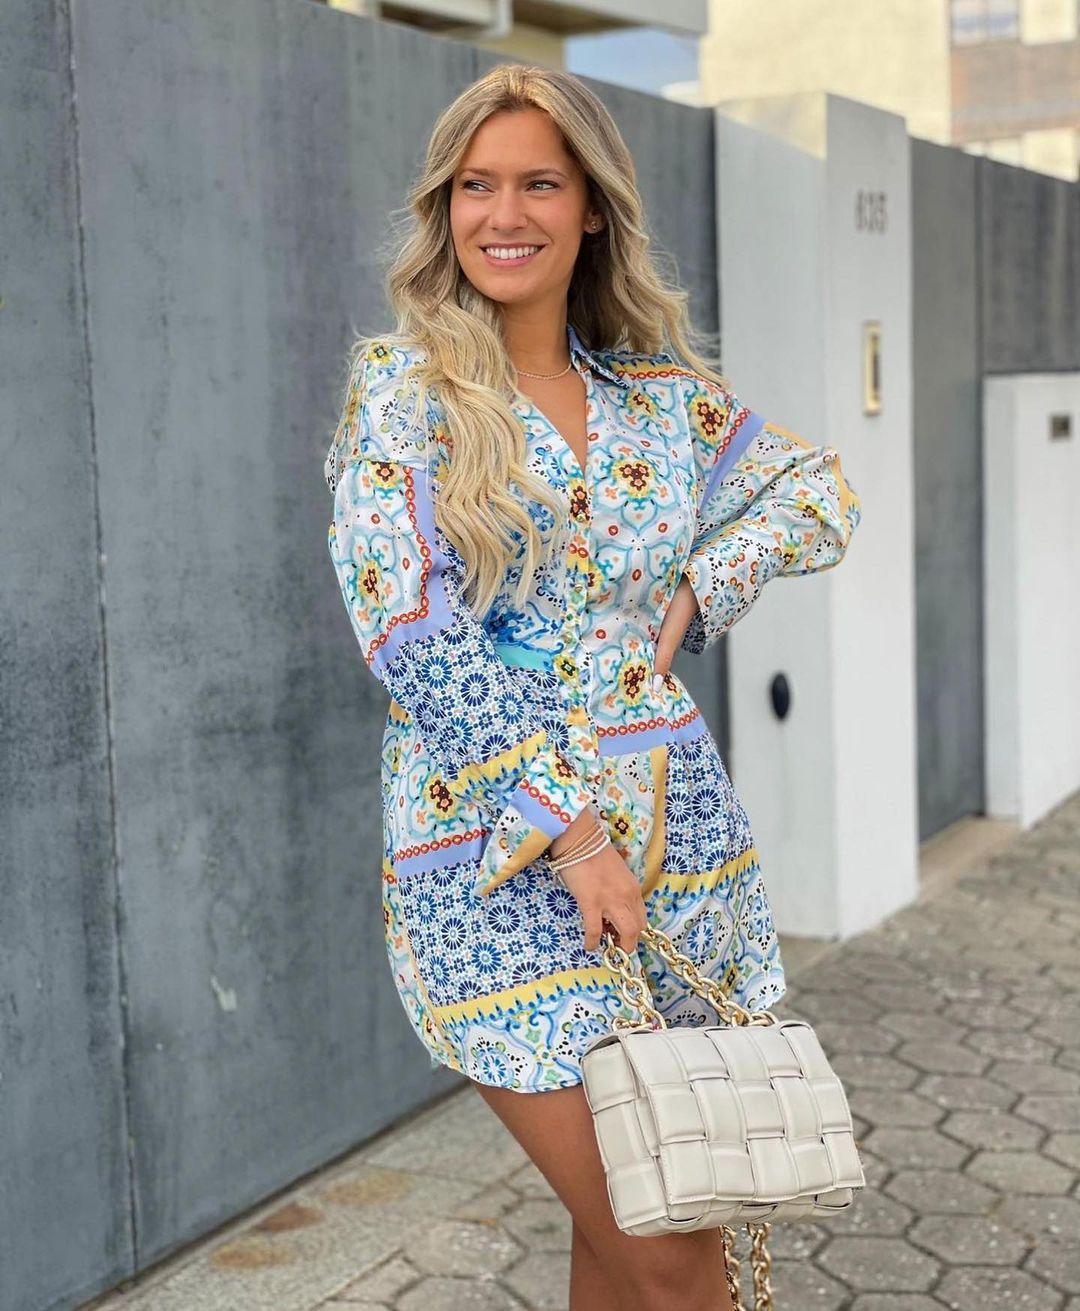 dress with patchwork print de Zara sur zara.outfits